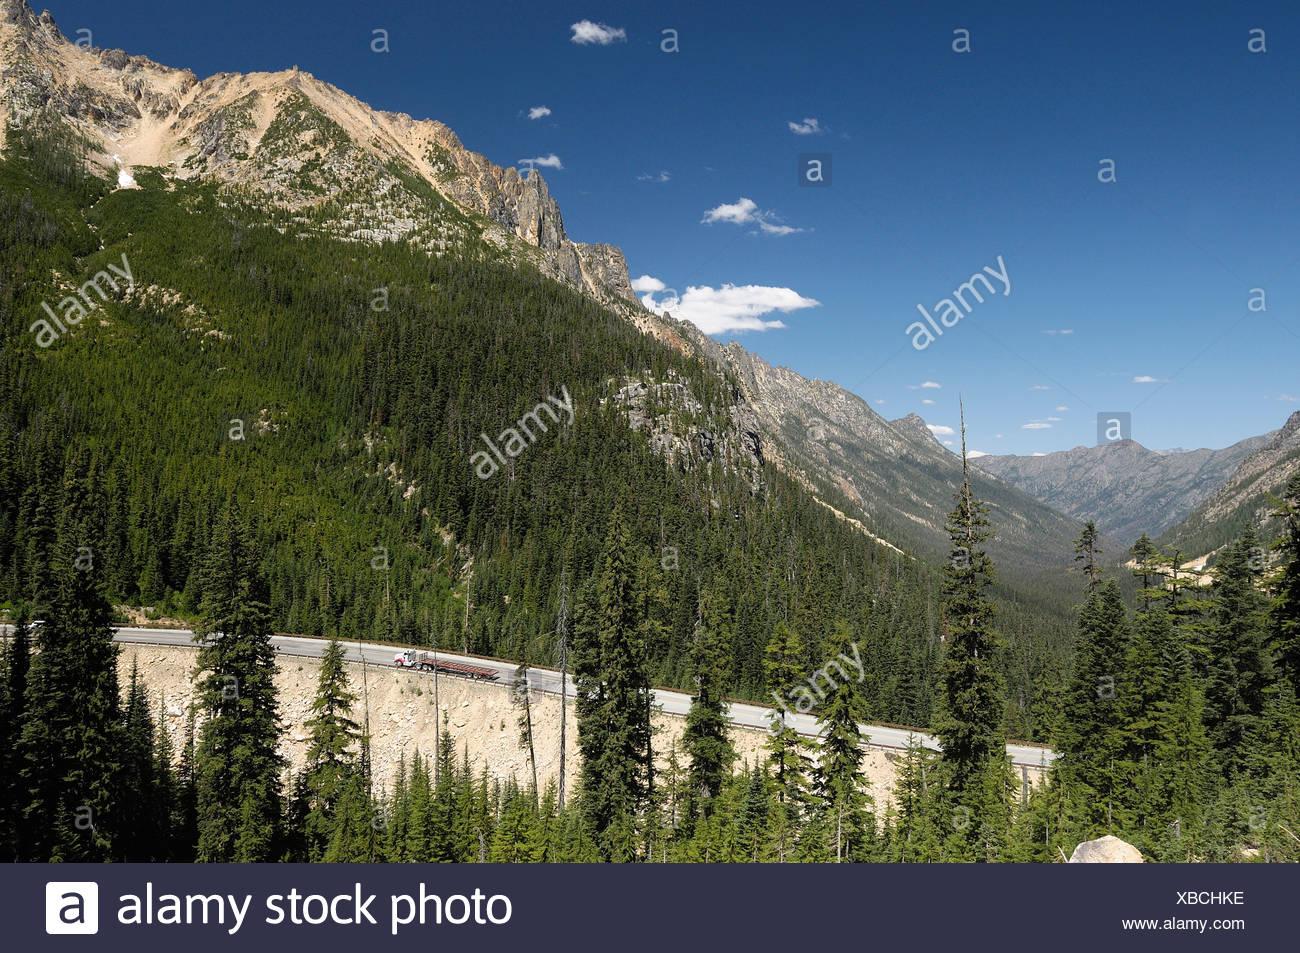 Highway 20 Washington Pass Mountain Road North Cascades National Park Marblemount Washington USA pass mountains forest - Stock Image